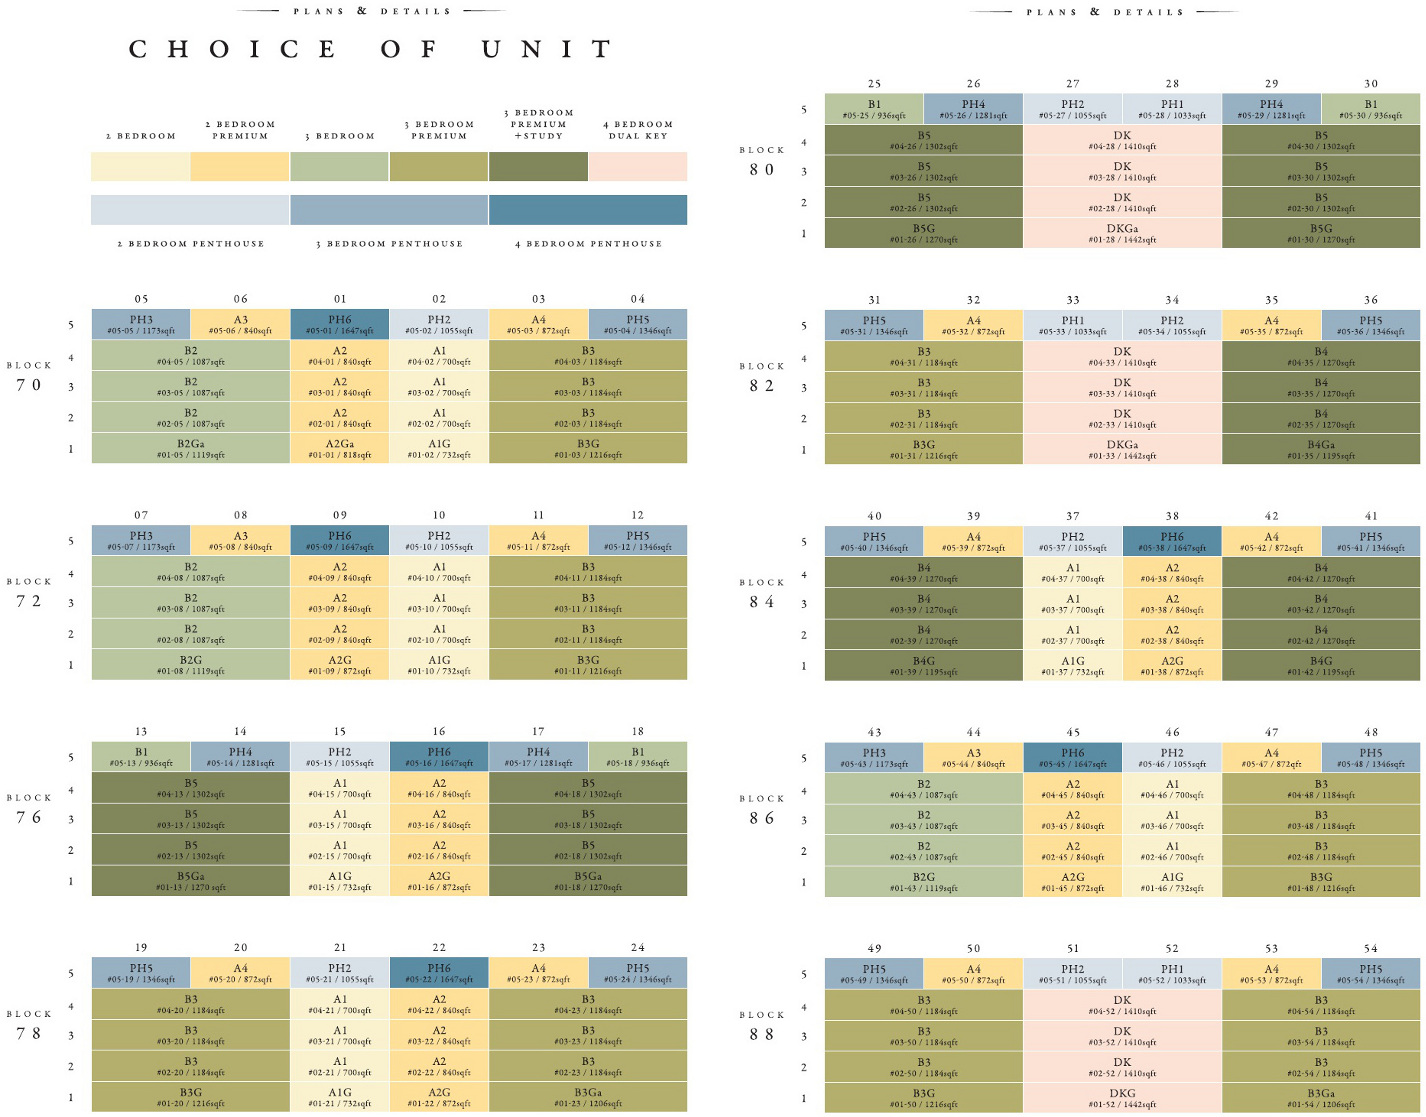 Seventy St Patricks Floor Plans :: Unit Types